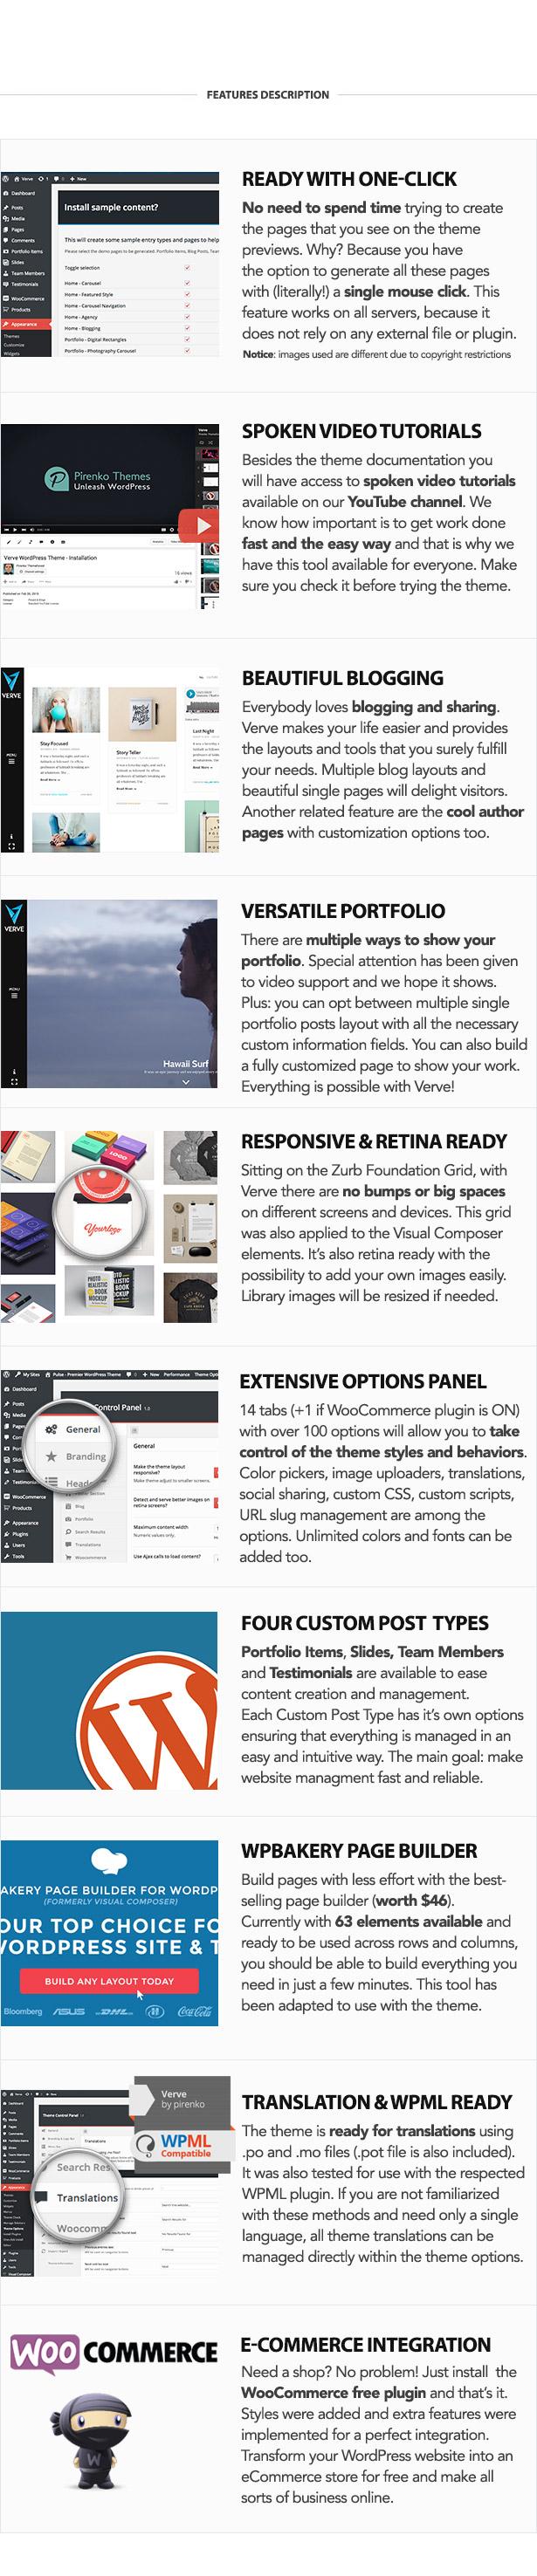 Verve - High-Style WordPress Theme - 4